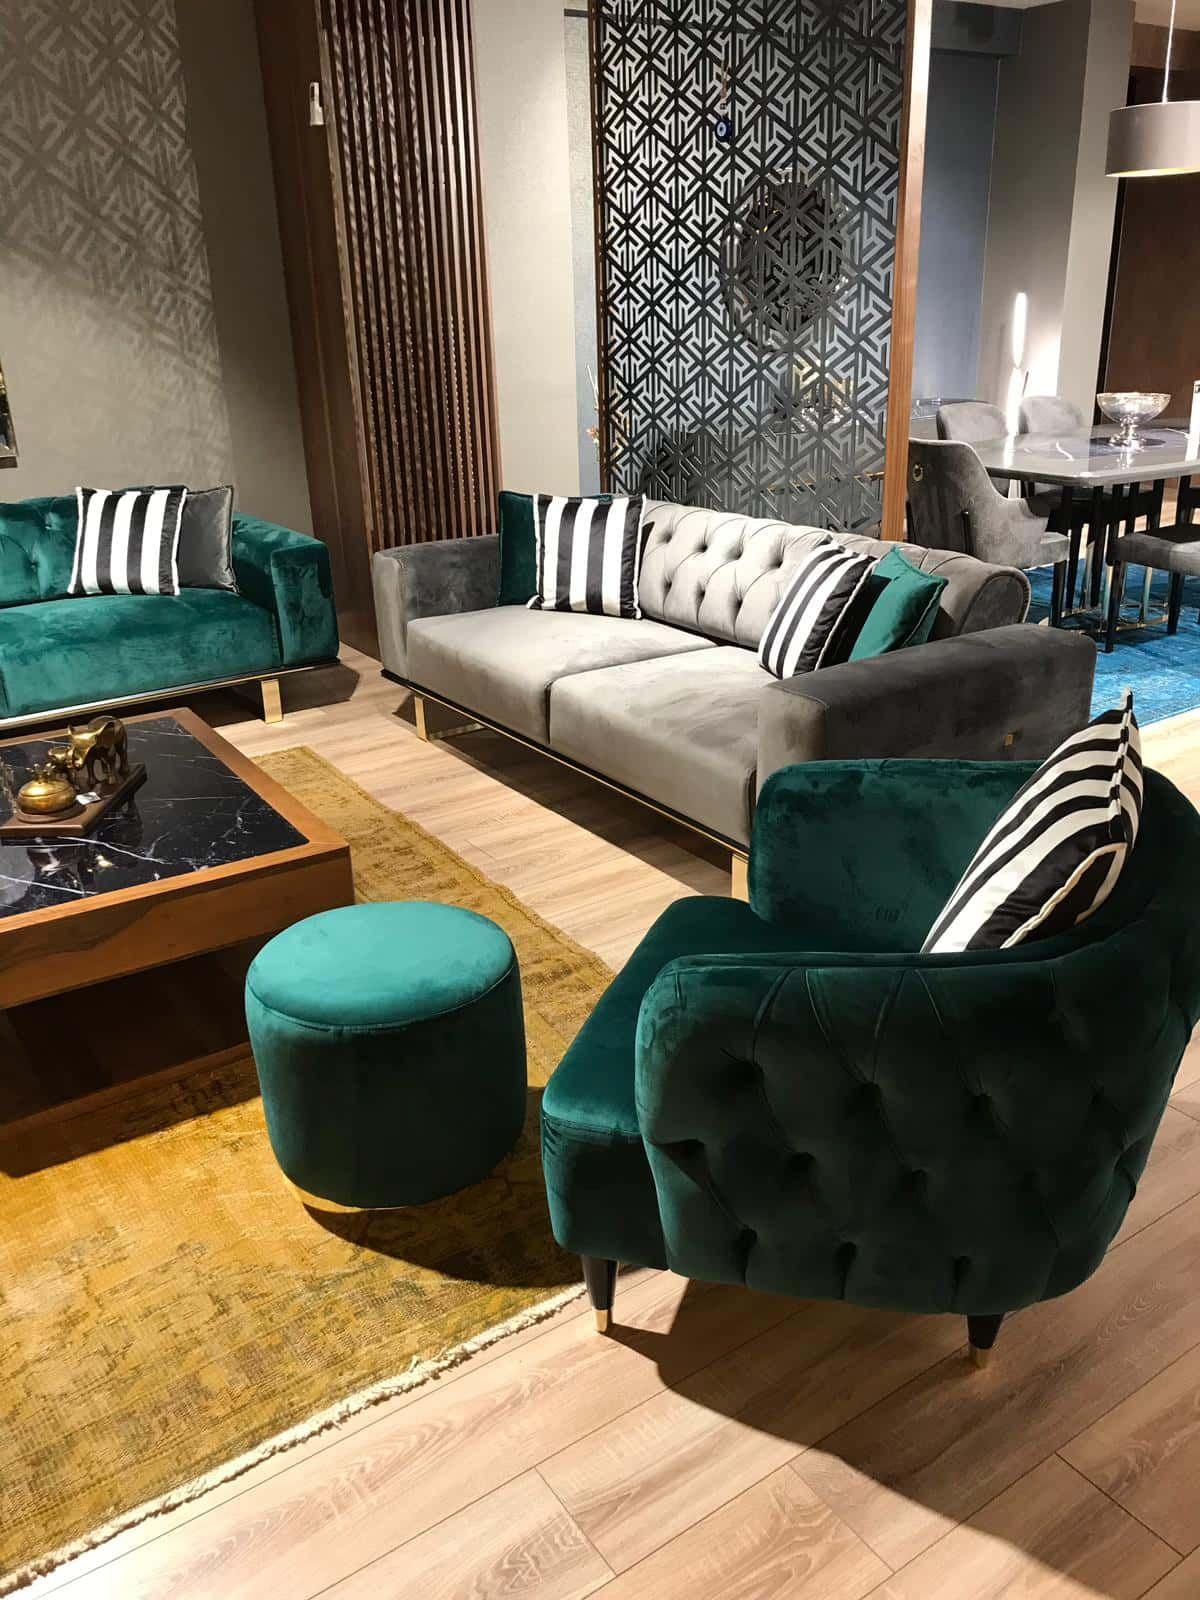 Belhi Koltuk Takimi 2020 Oturma Odasi Fikirleri Ikea Oturma Odasi Oturma Odasi Tasarimlari